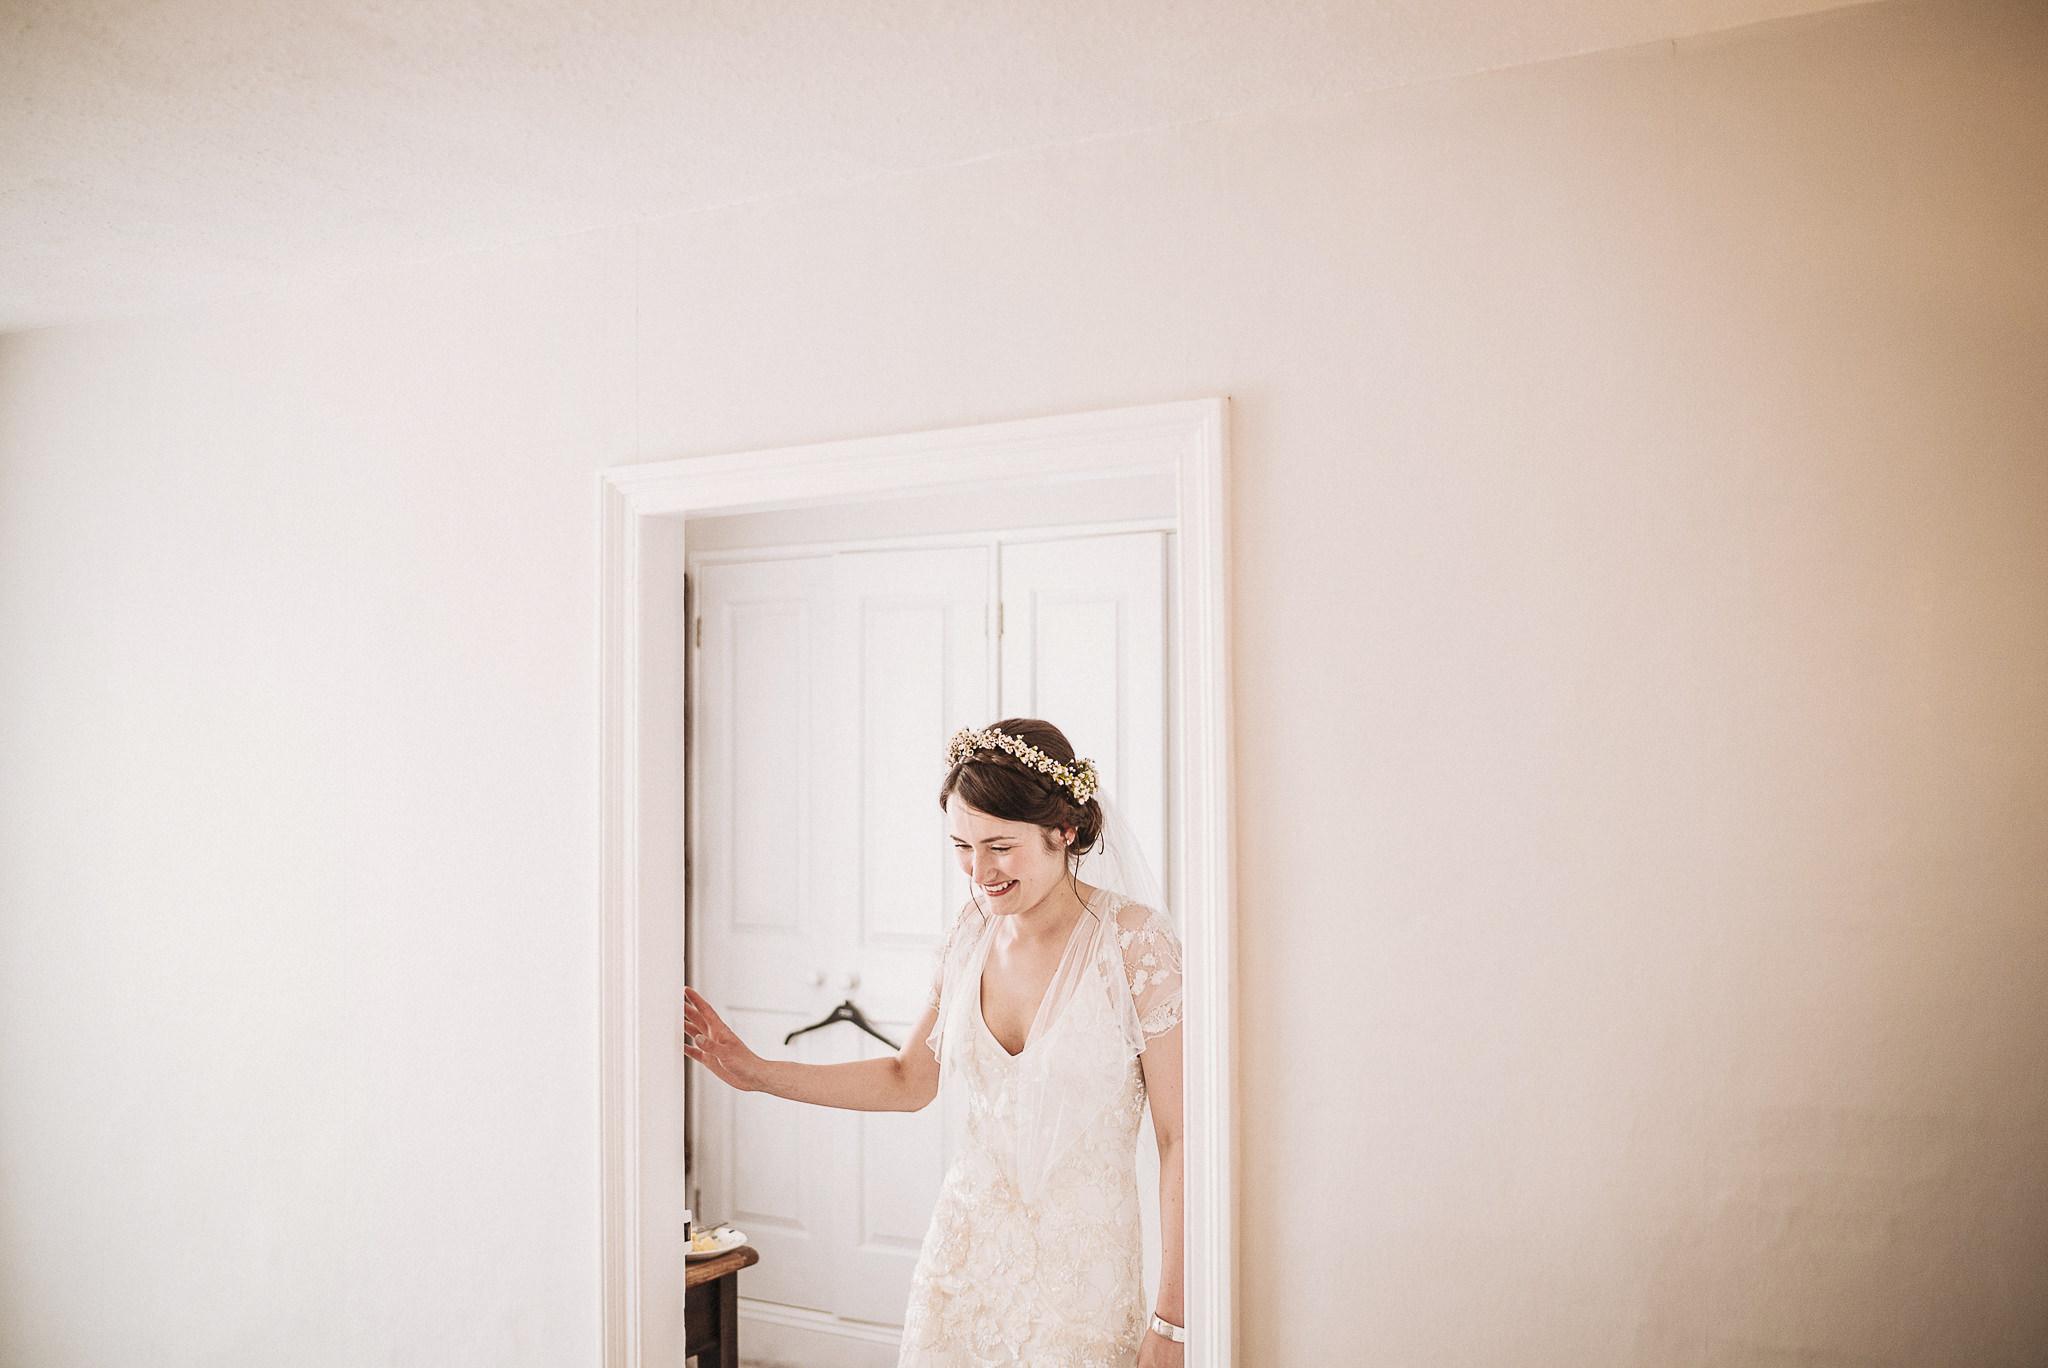 paul-marbrook-Farm-Wedding-Photographer-Lancashire-90020